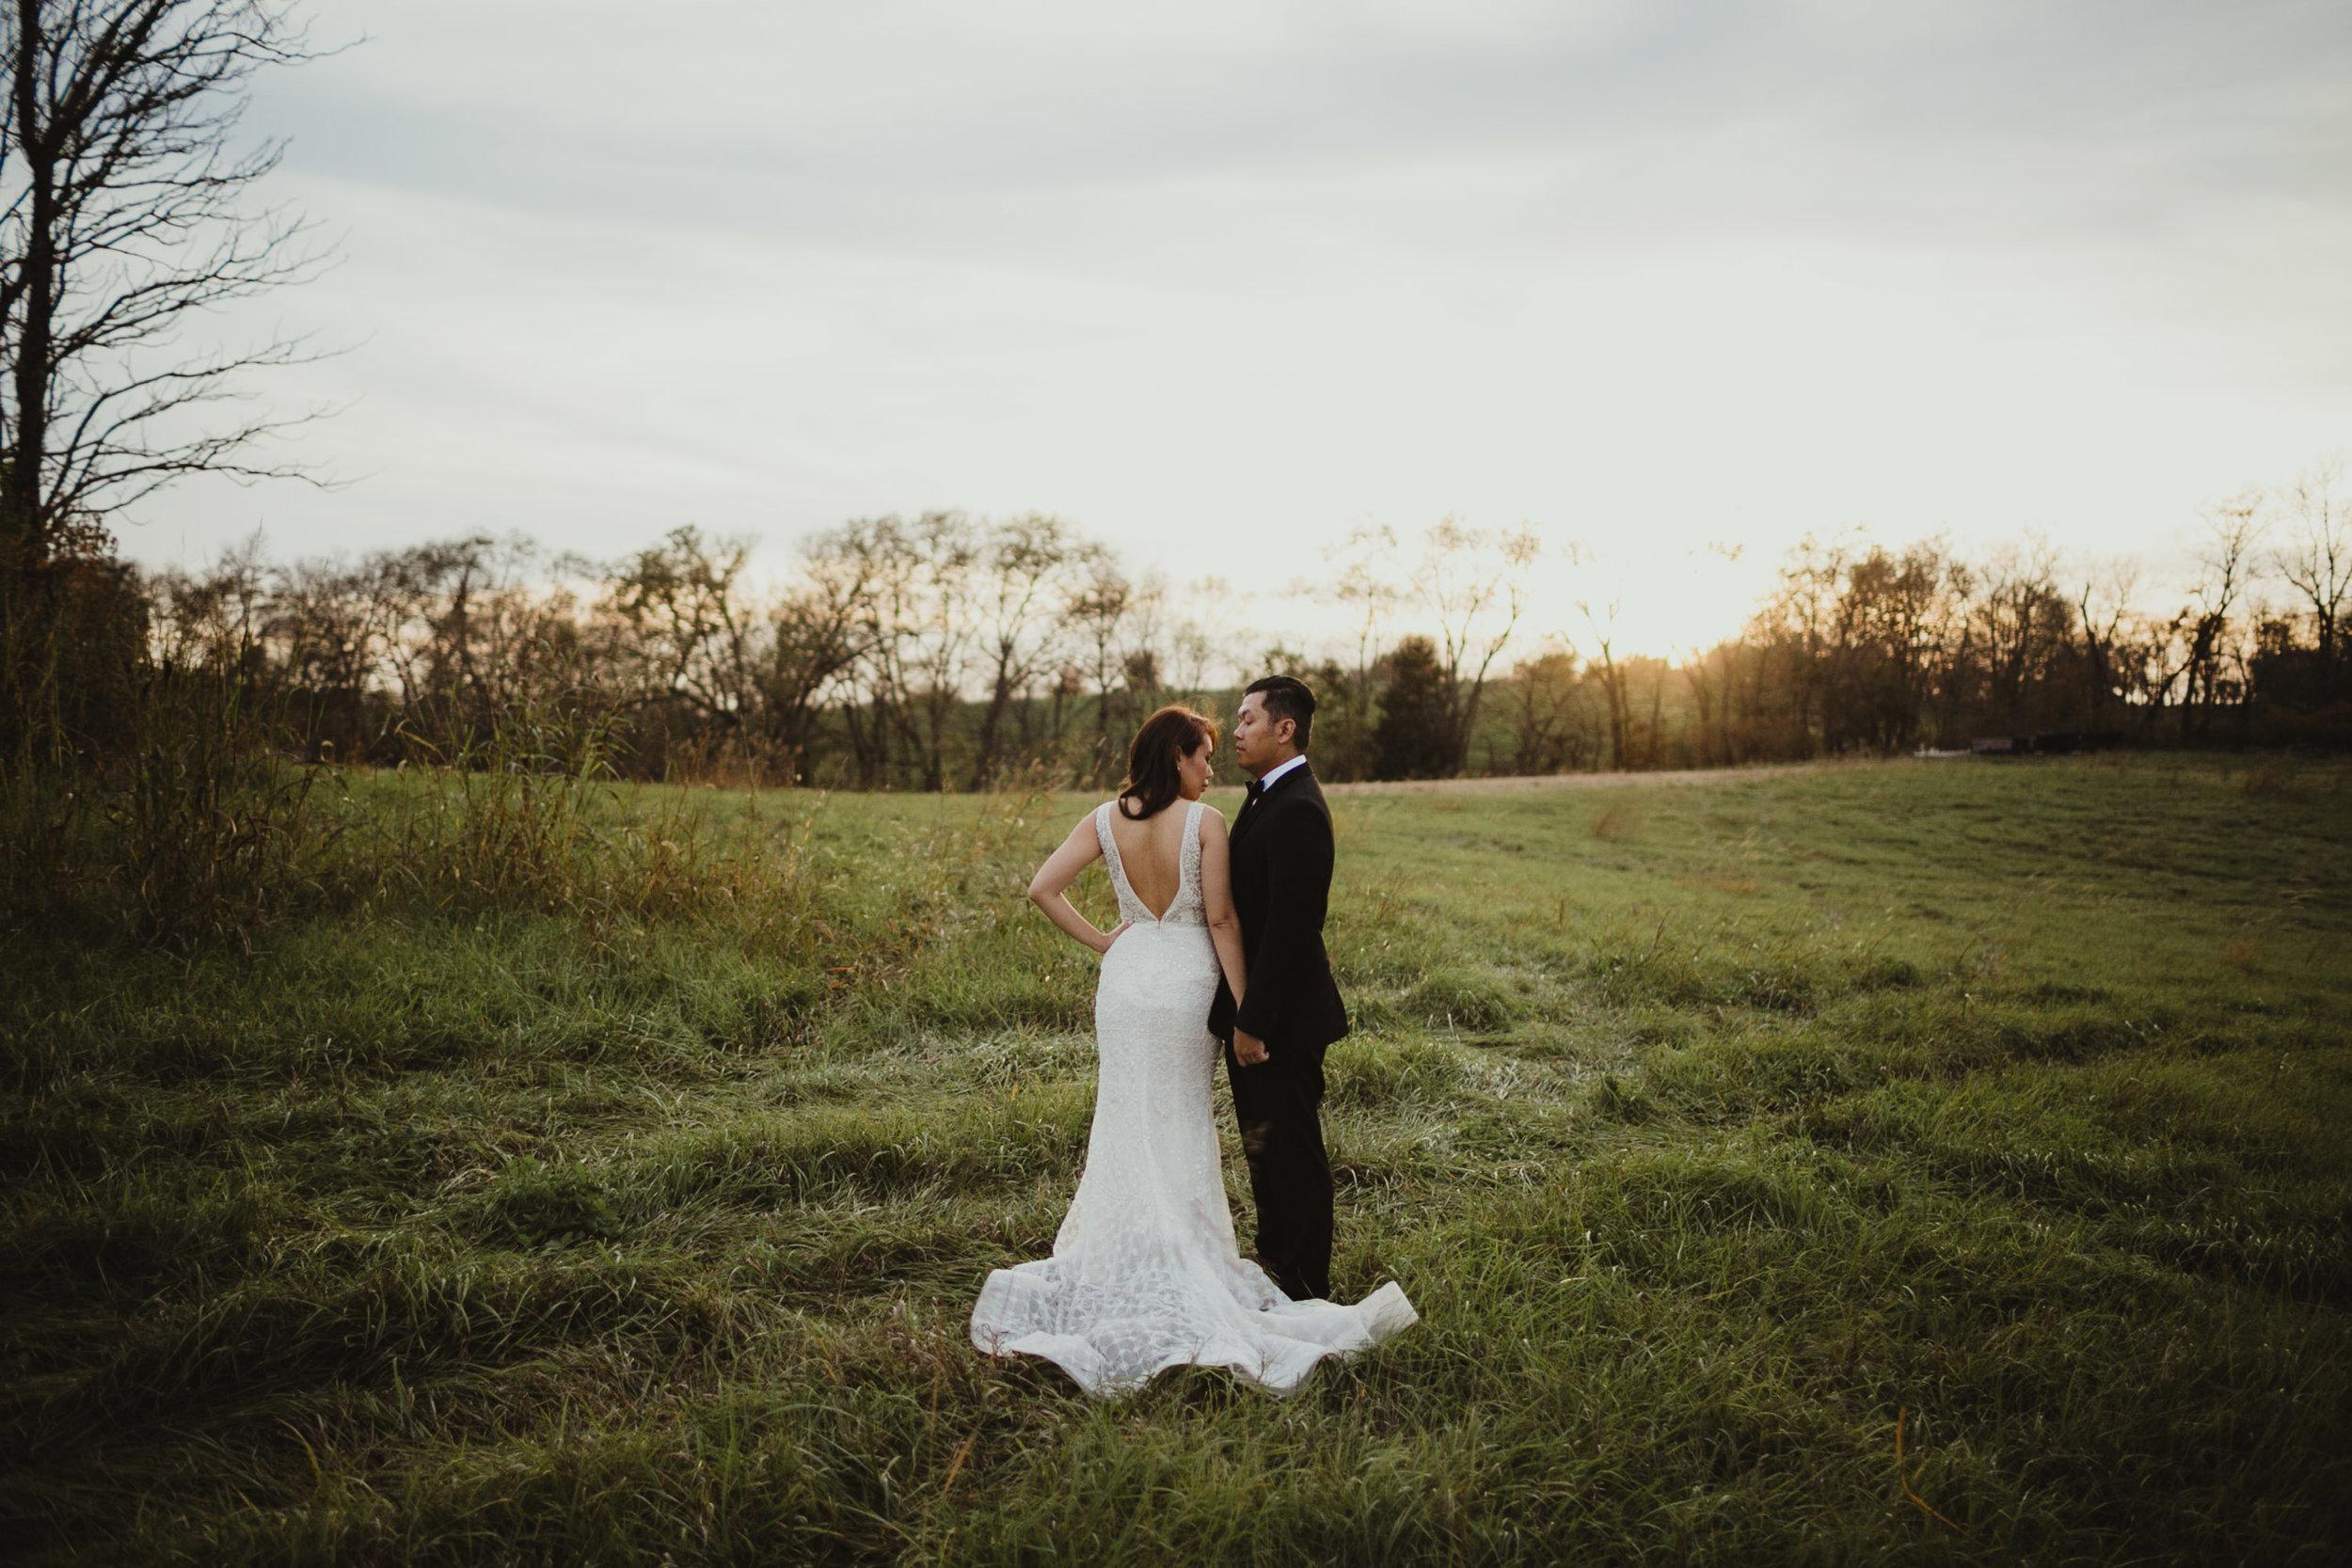 kansas-city-wedding-photographer_032.jpg